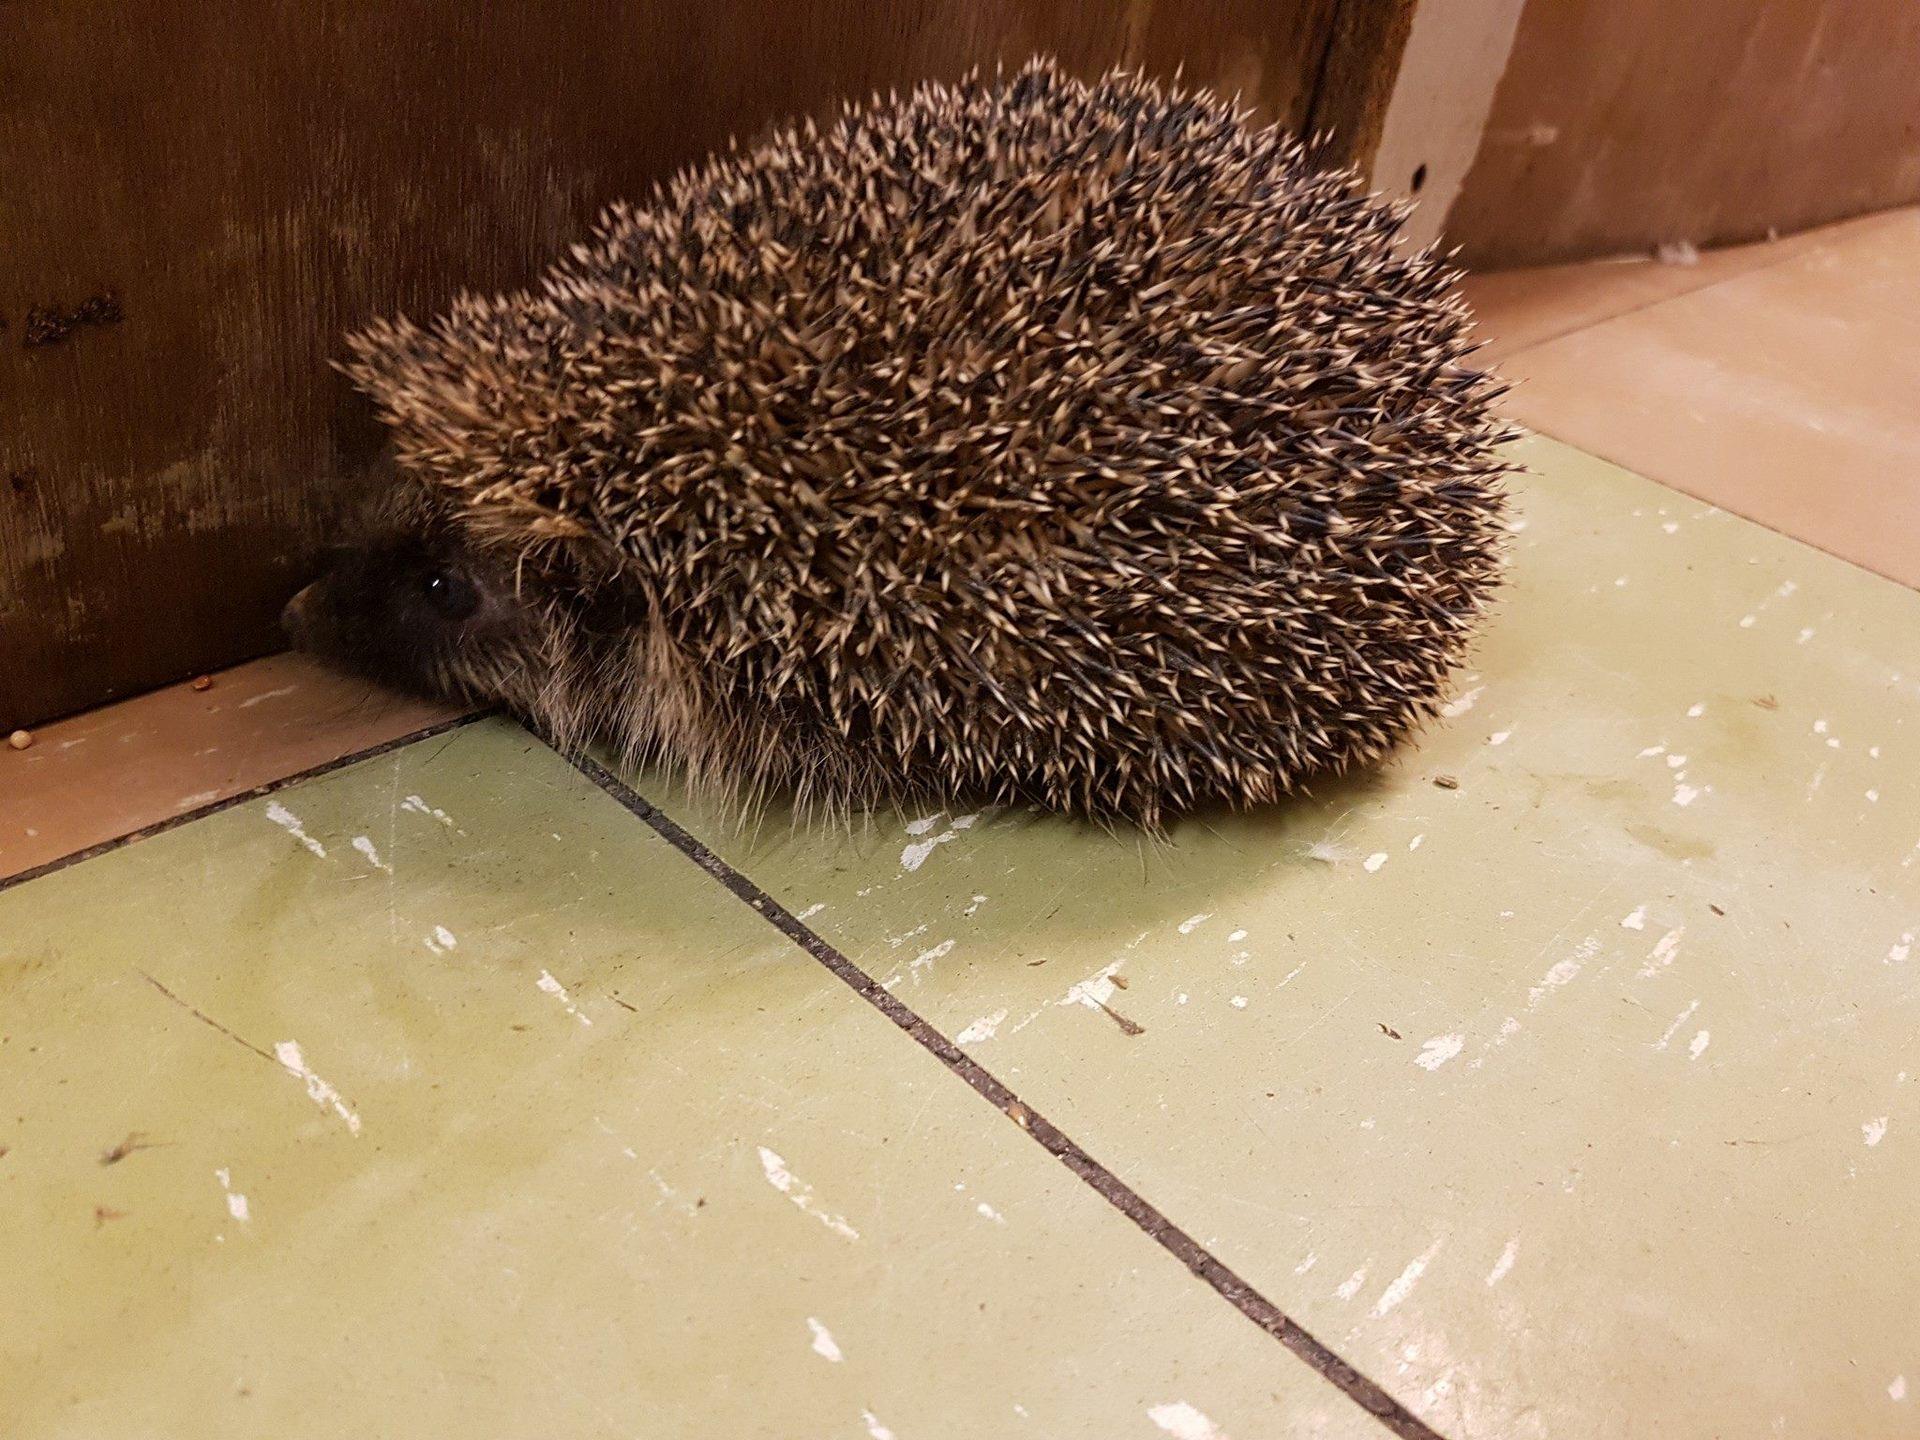 a ball of mud hedgehog4.jpg